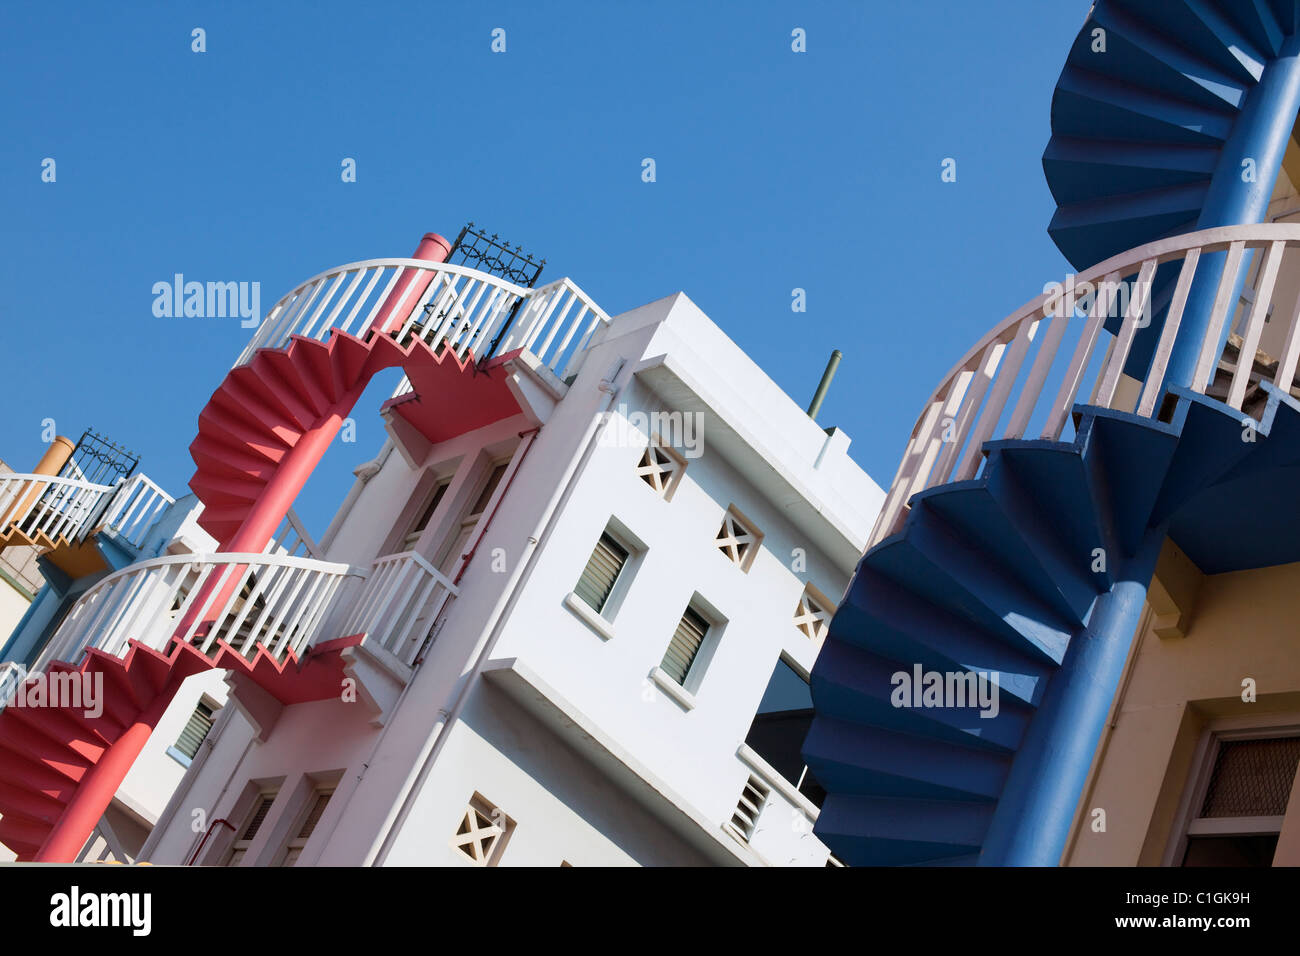 Farbenfrohe Architektur des Wohnblocks.  Bugis, Singapur Stockbild